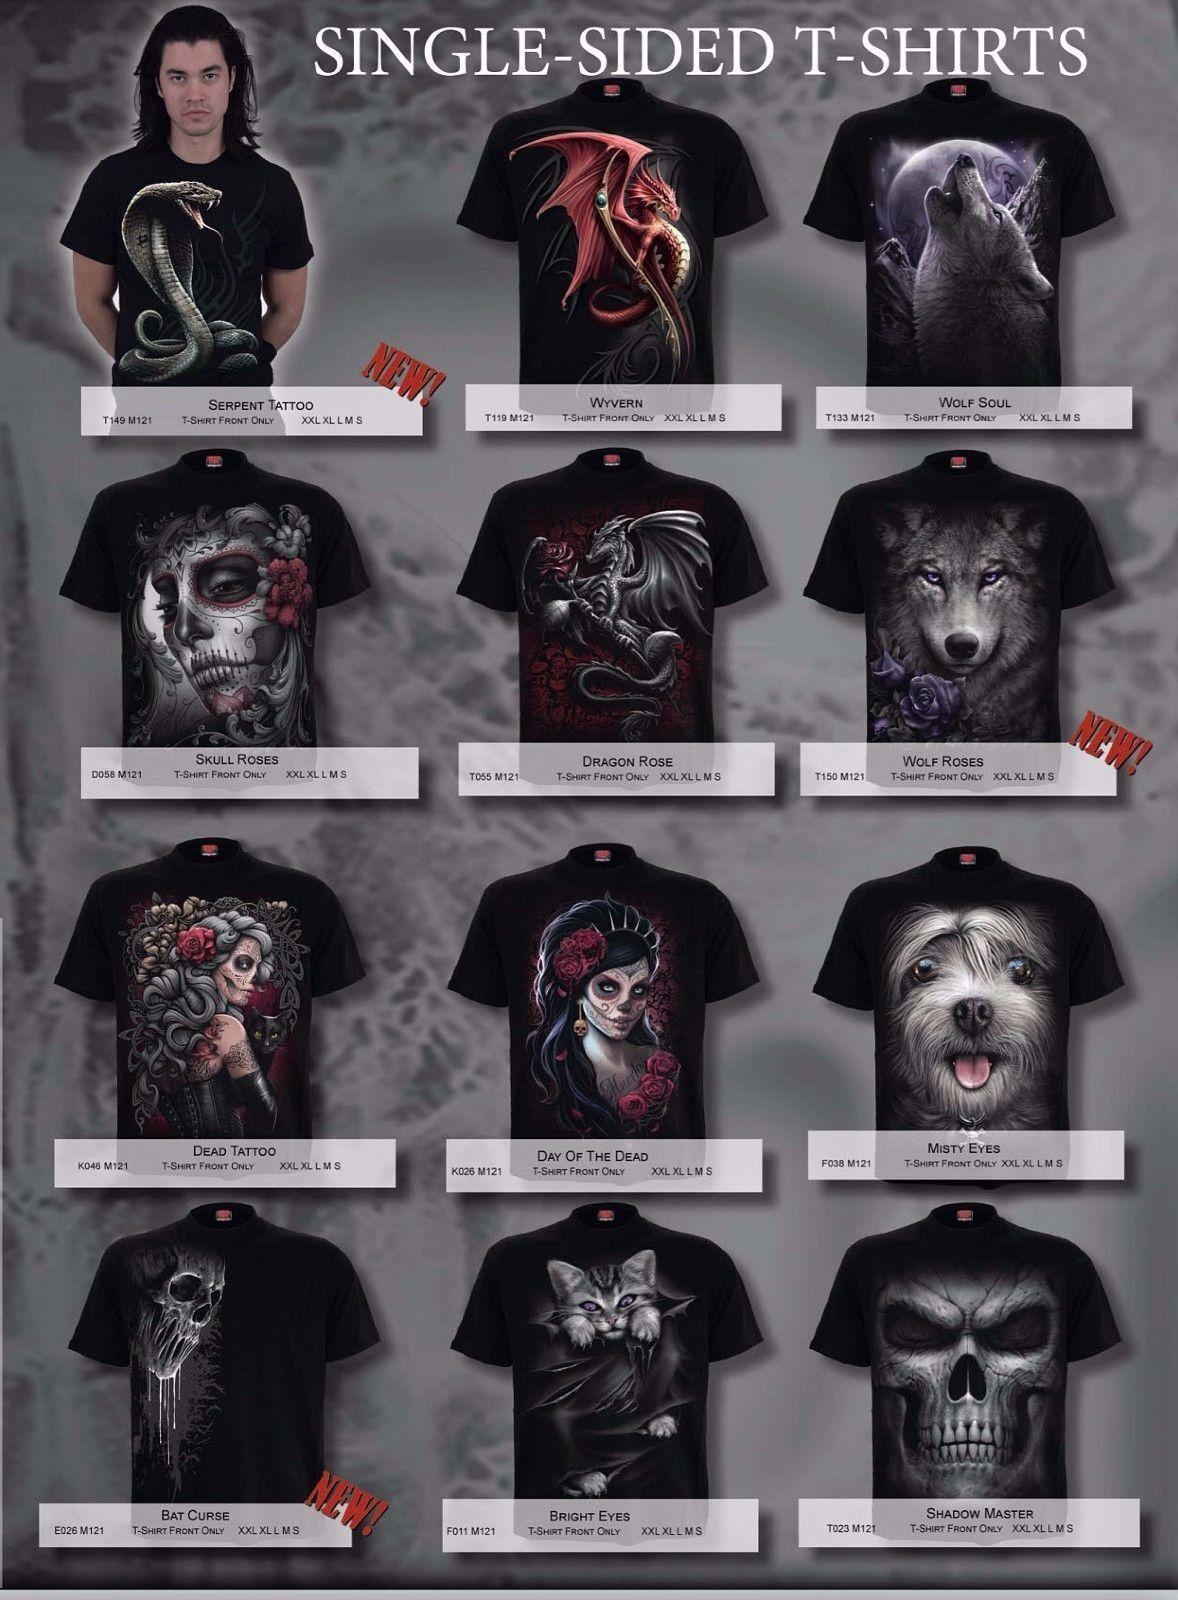 SPIRAL Direct stampa sul davanti SHIRT/TOP Designs Teschio/Dragon/Xmas/Rosa/Lupo/Regalo/T SHIRT/TOP davanti 28f7e5